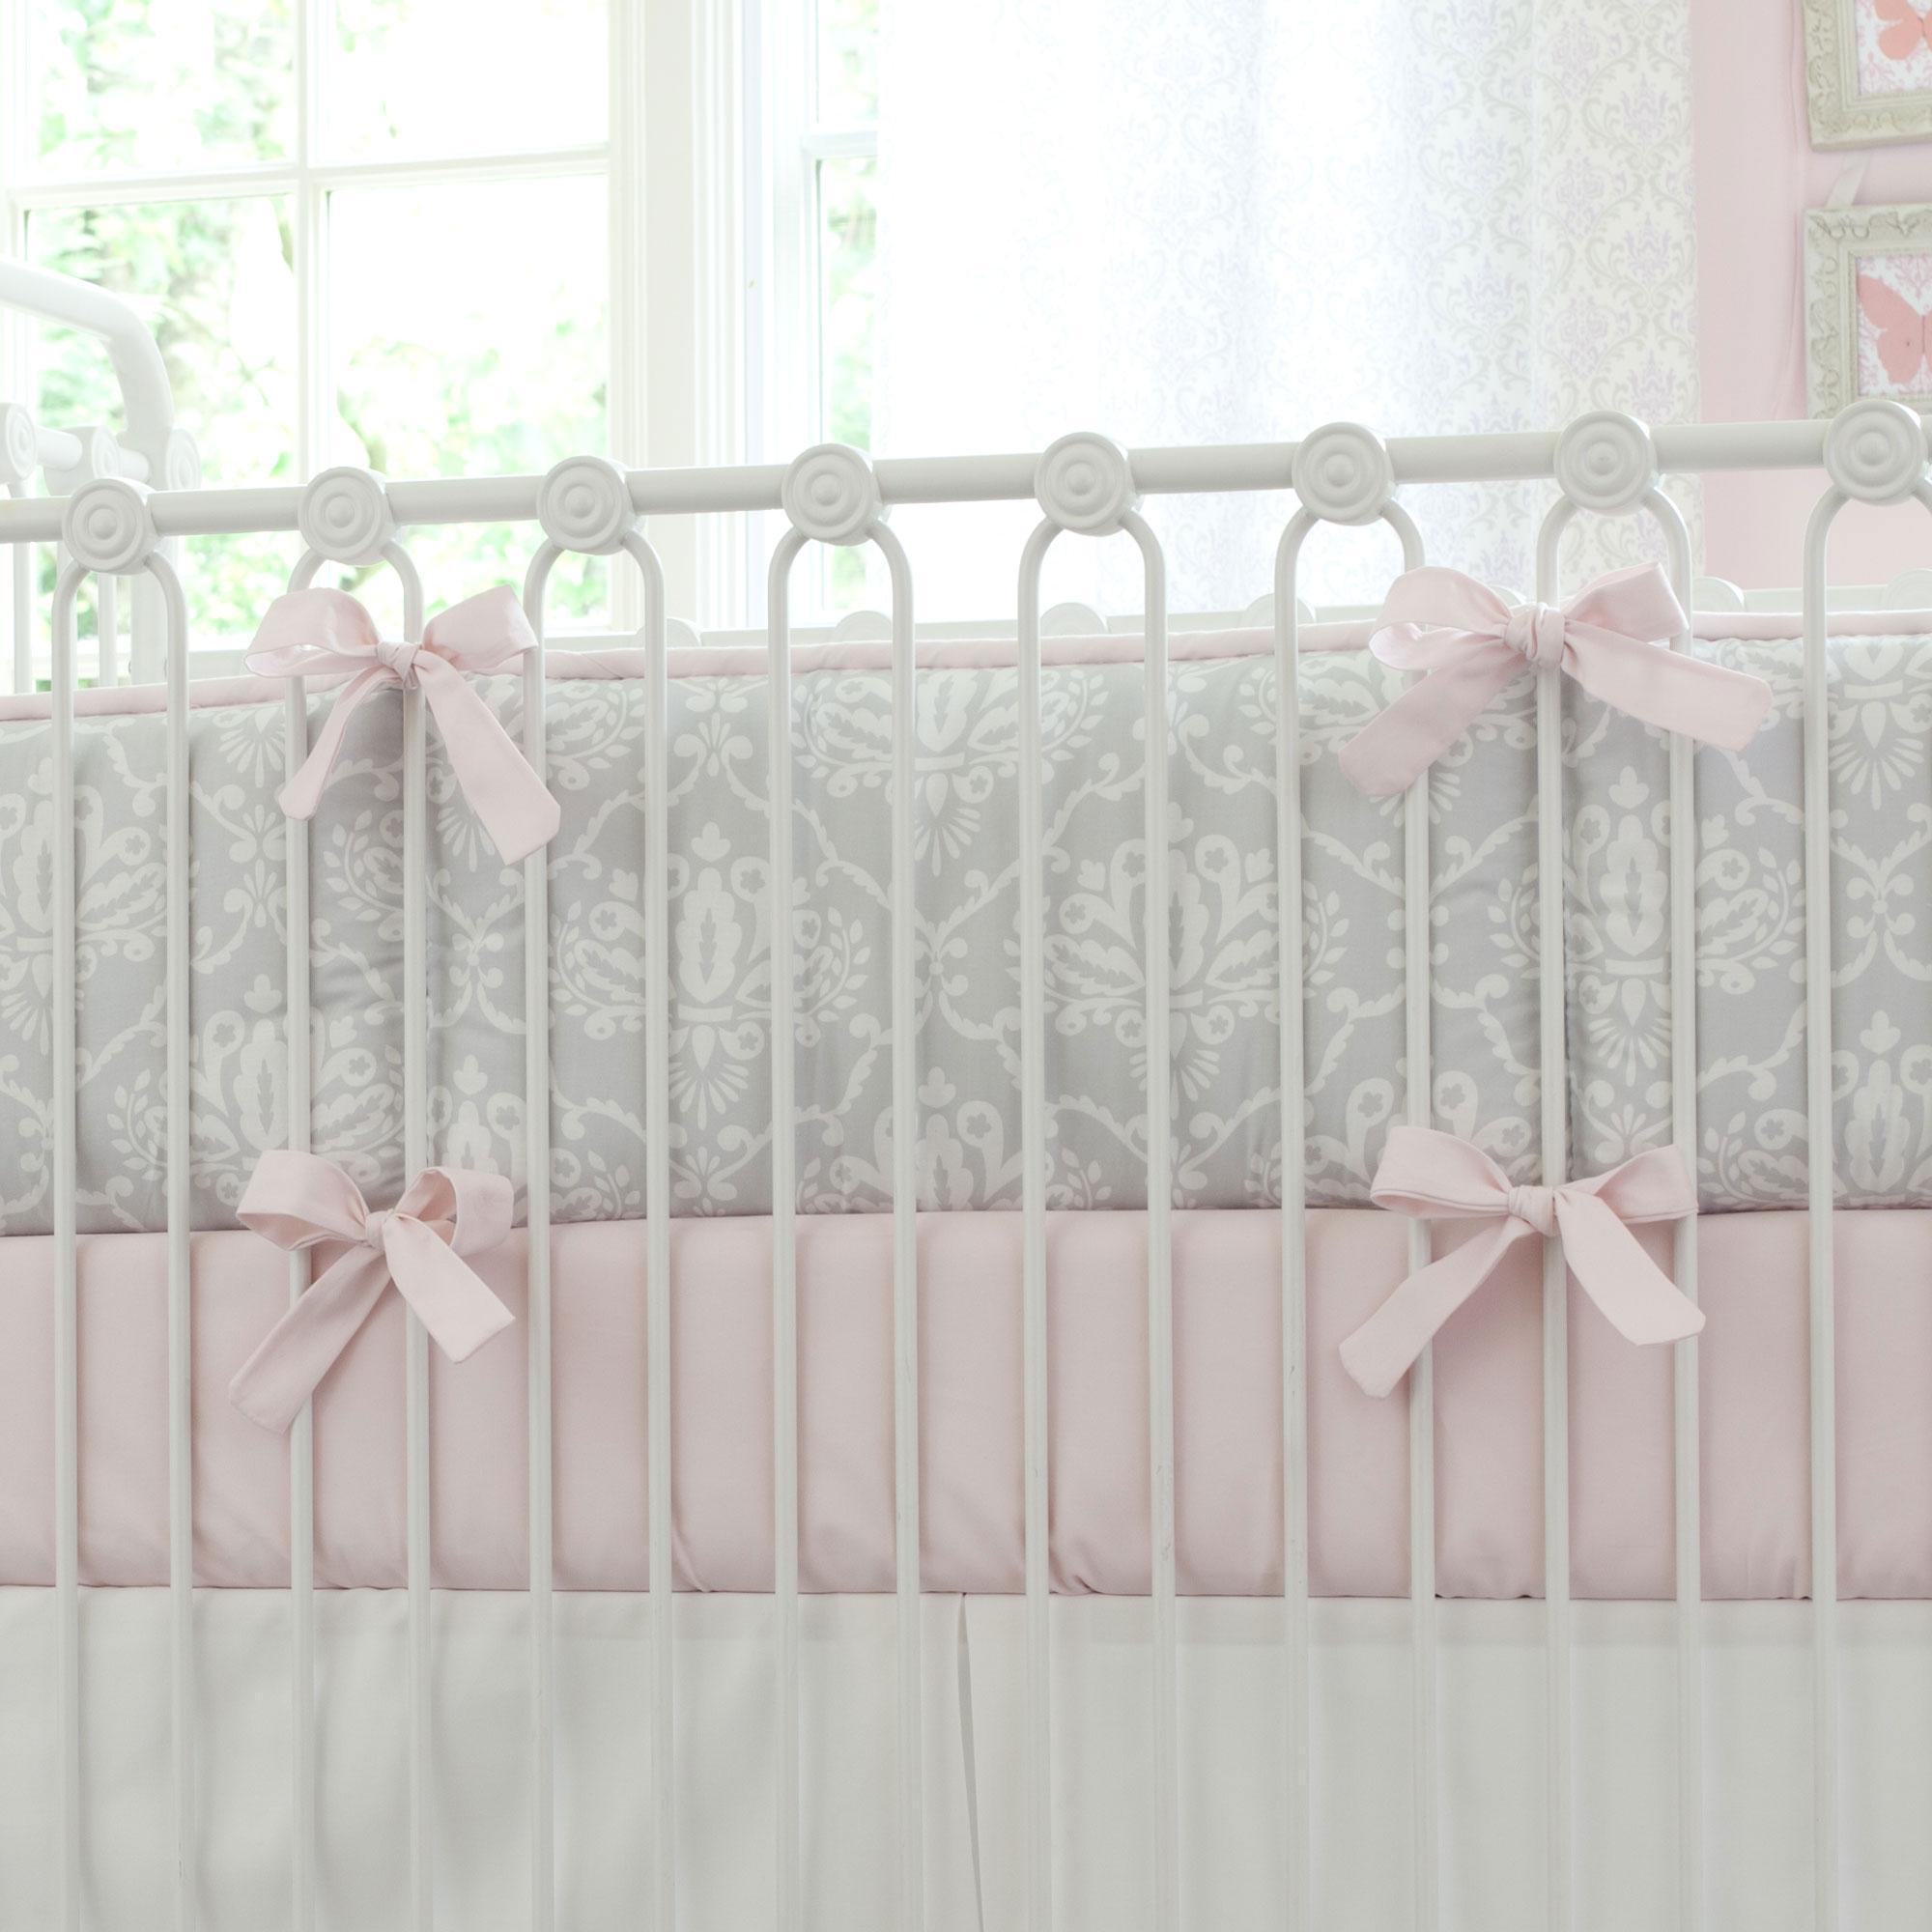 Crib Bumpers | Navy Blue Crib Bumper | Crib Bumper Set